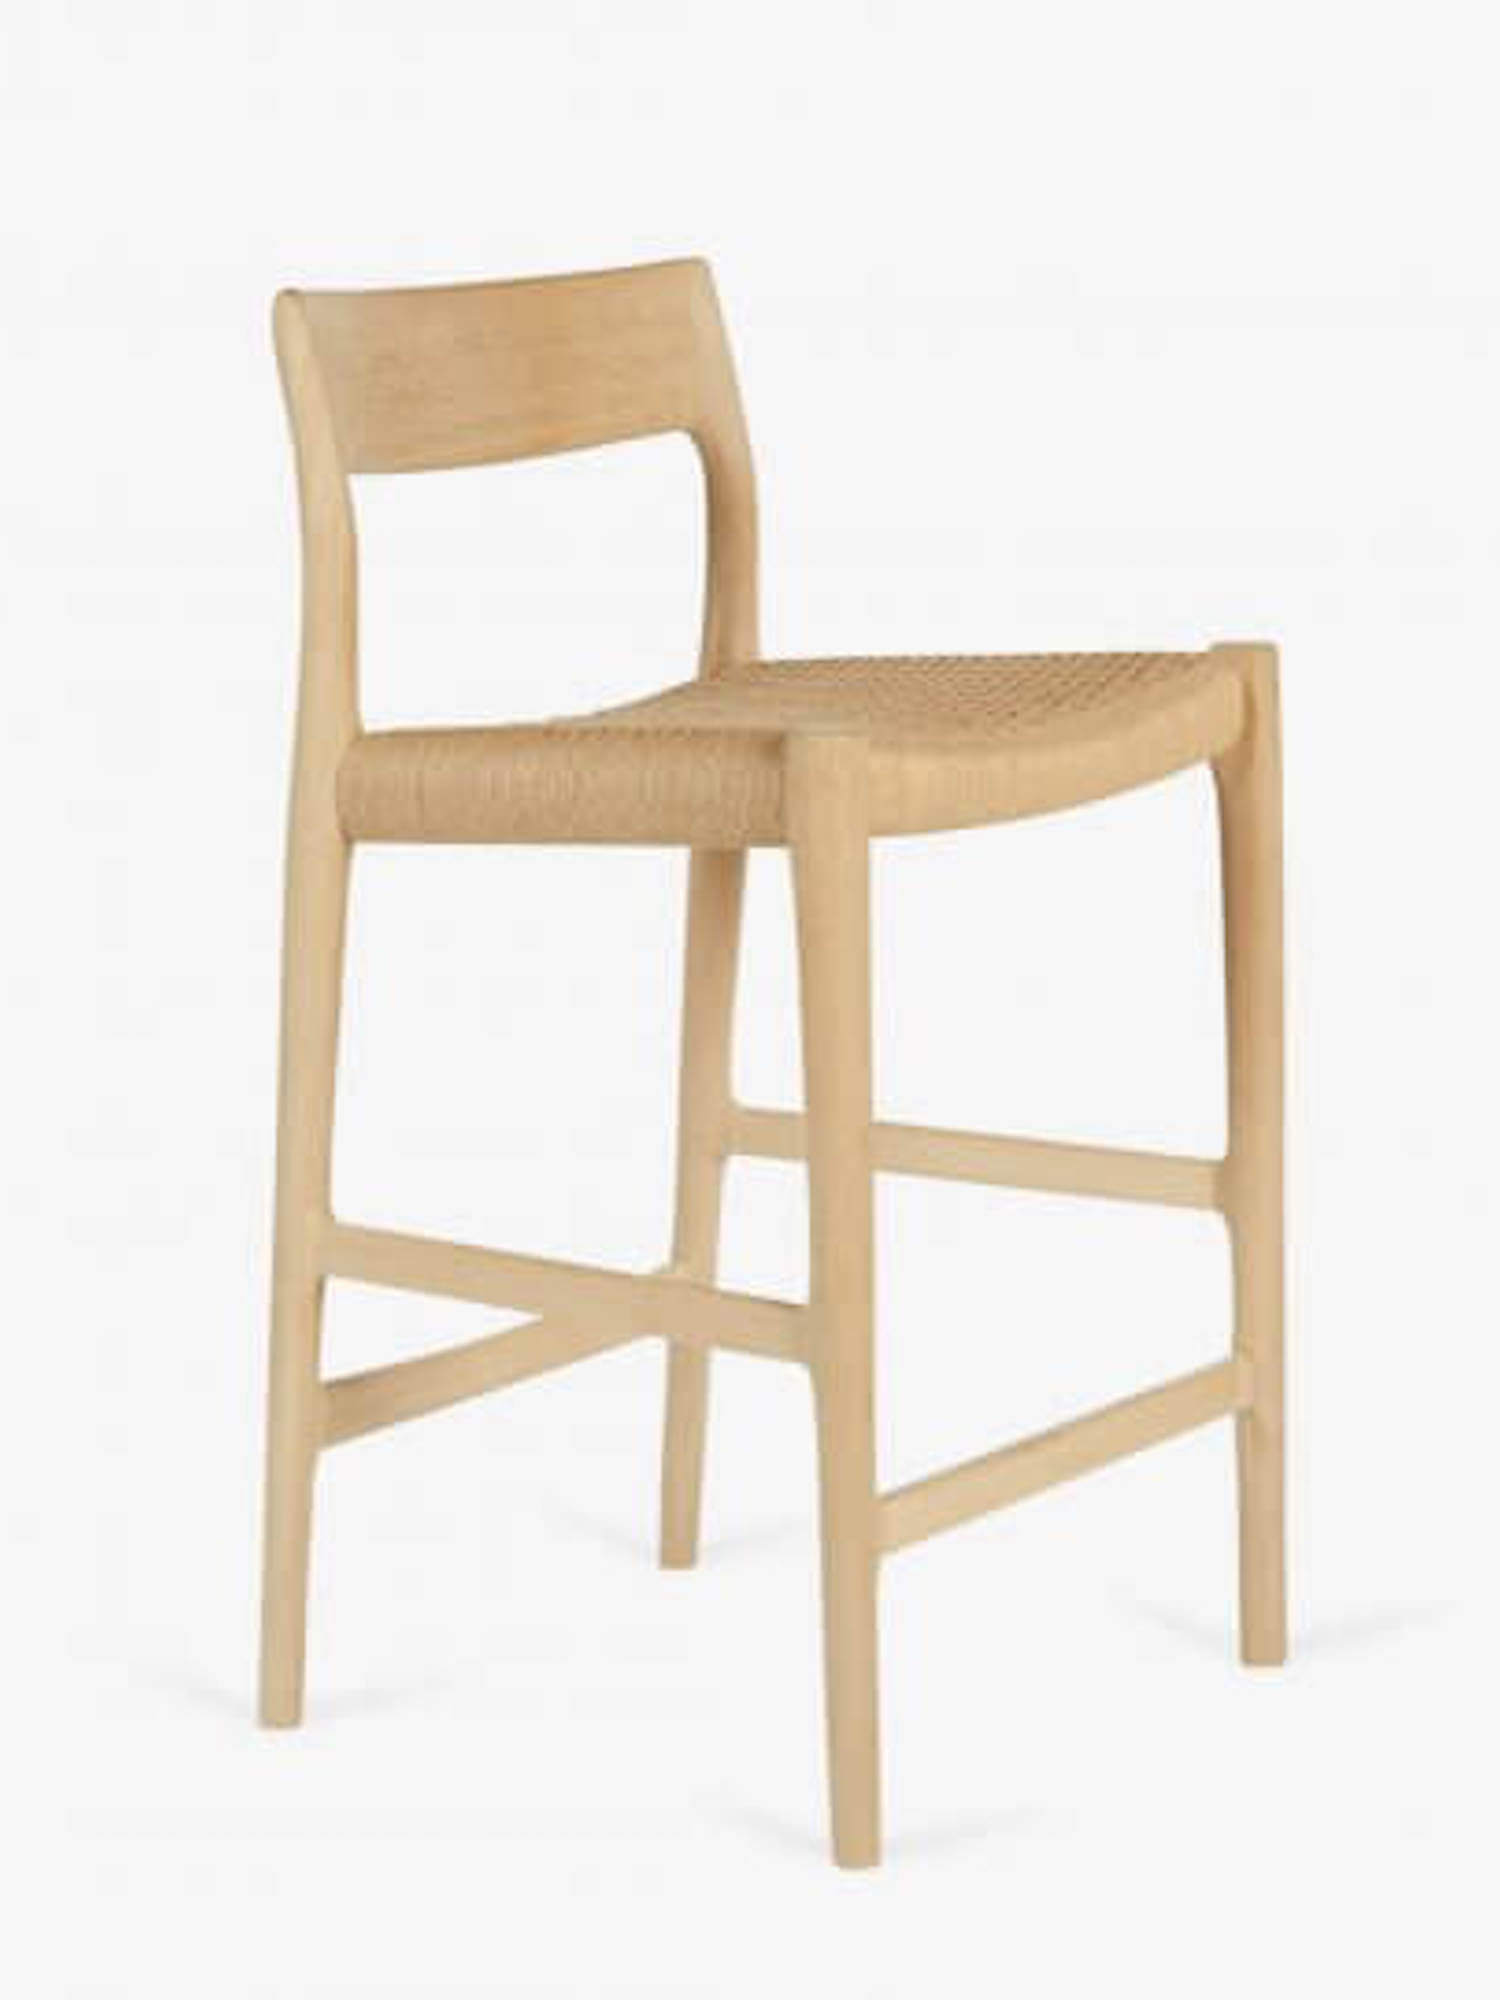 Est Living Design Directory Great Dane Moller 77 Stool4 750x540